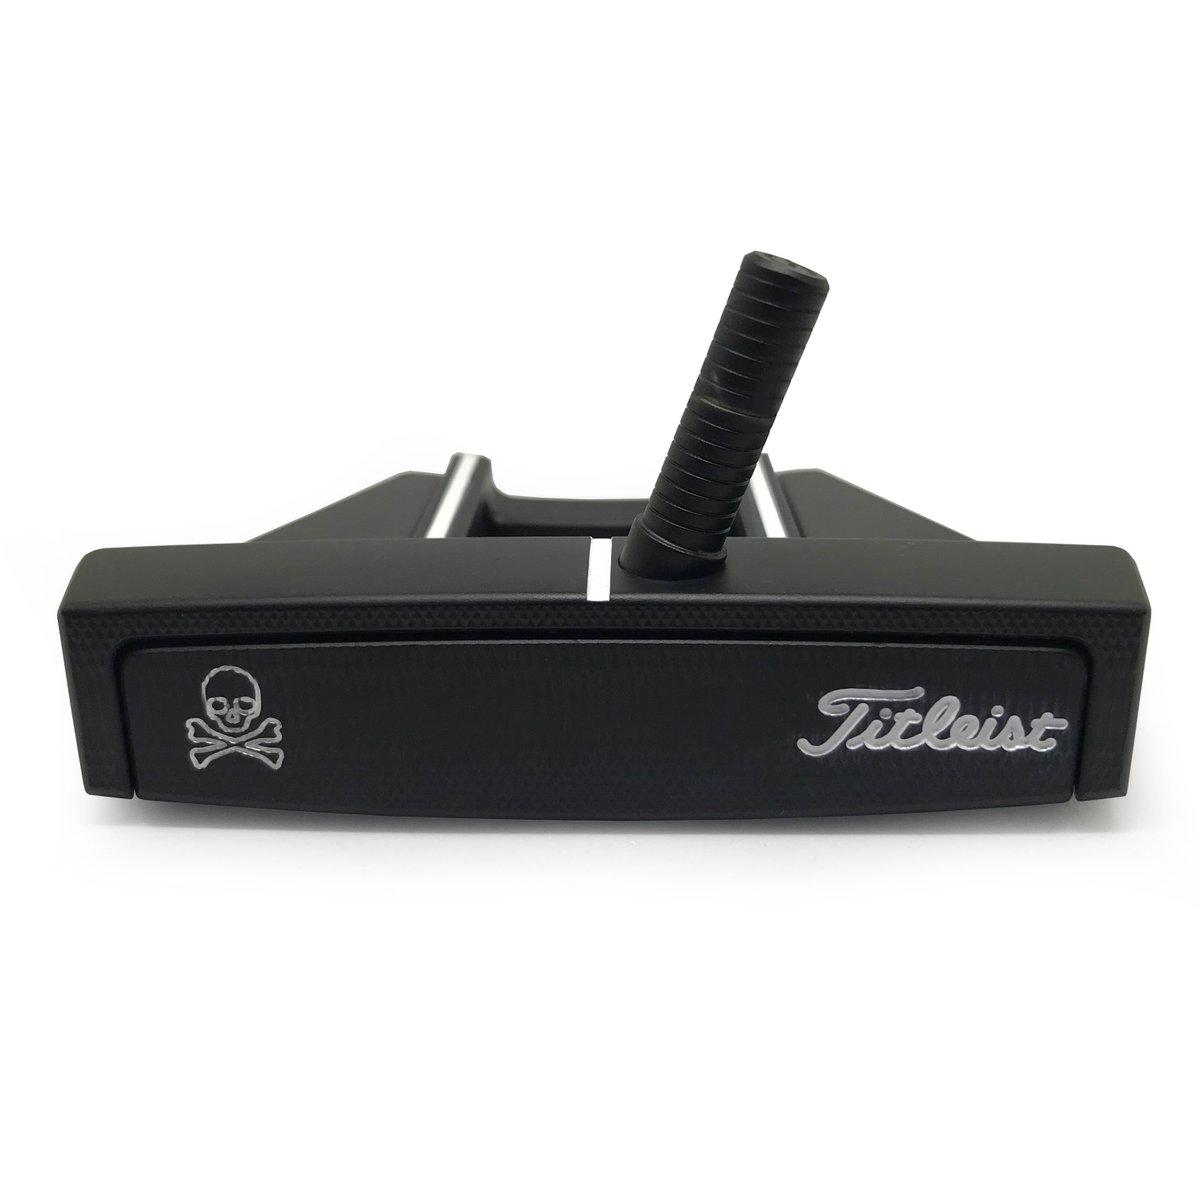 Golf Customs on Twitter: